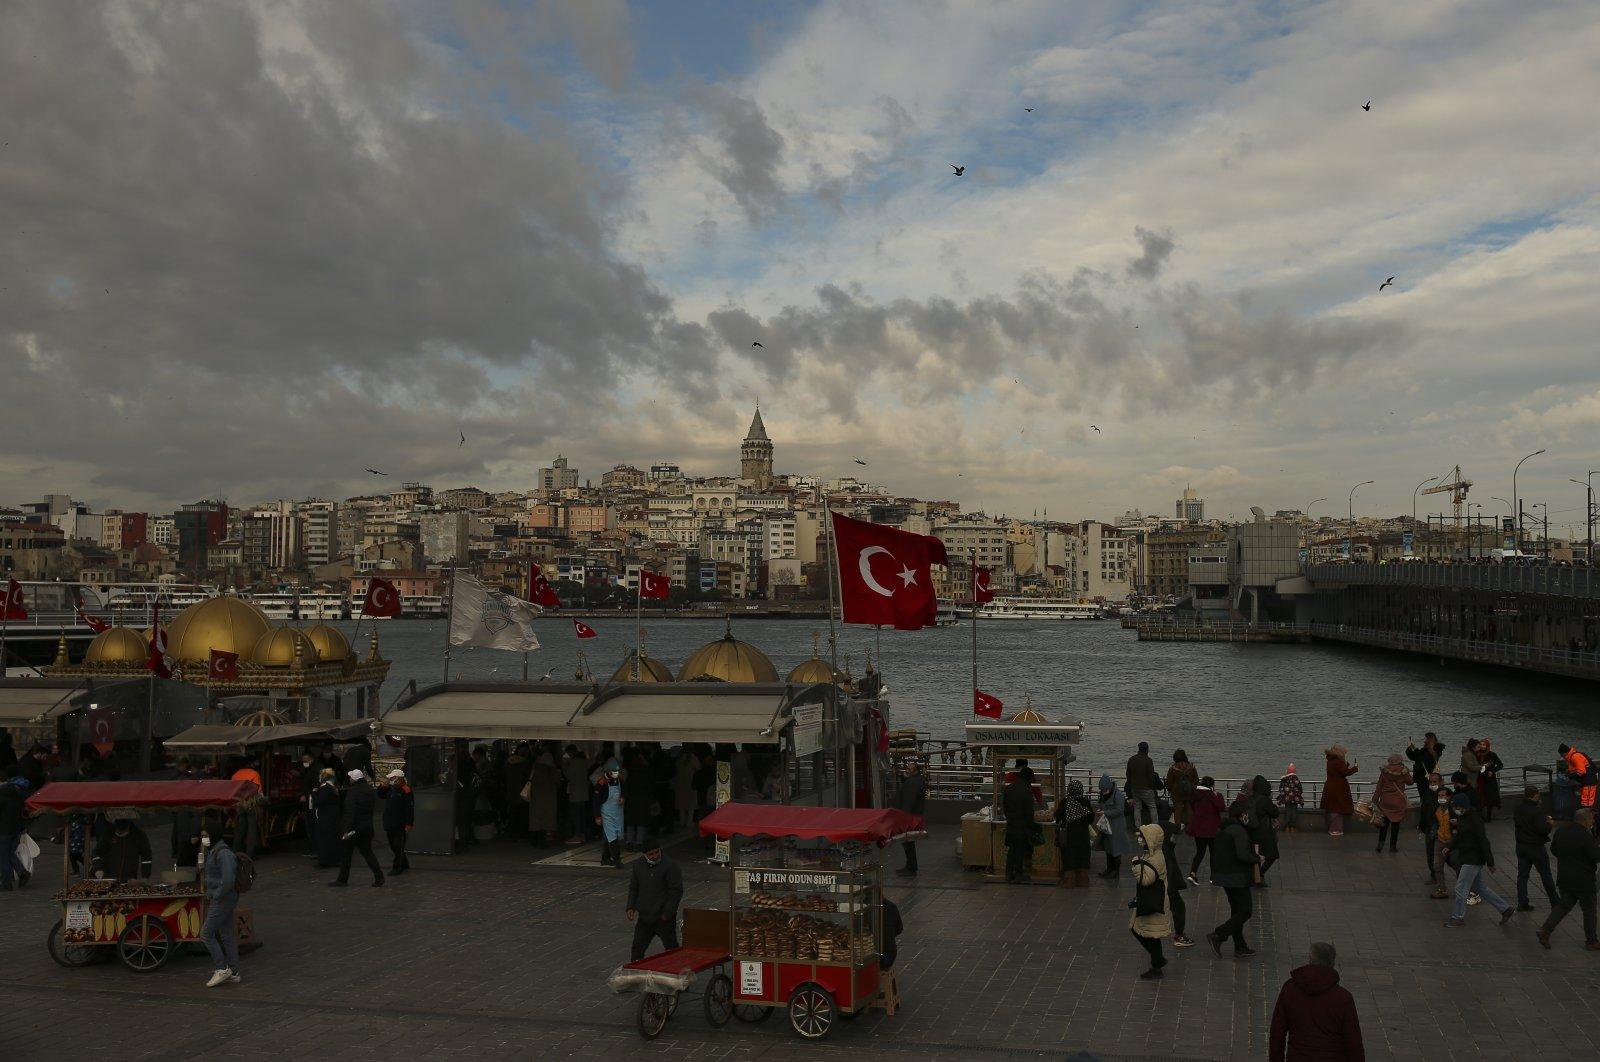 People wearing masks to help protect against the spread of the coronavirus walk near Galata Bridge in Istanbul, Turkey, Jan. 29, 2021. (AP Photo)